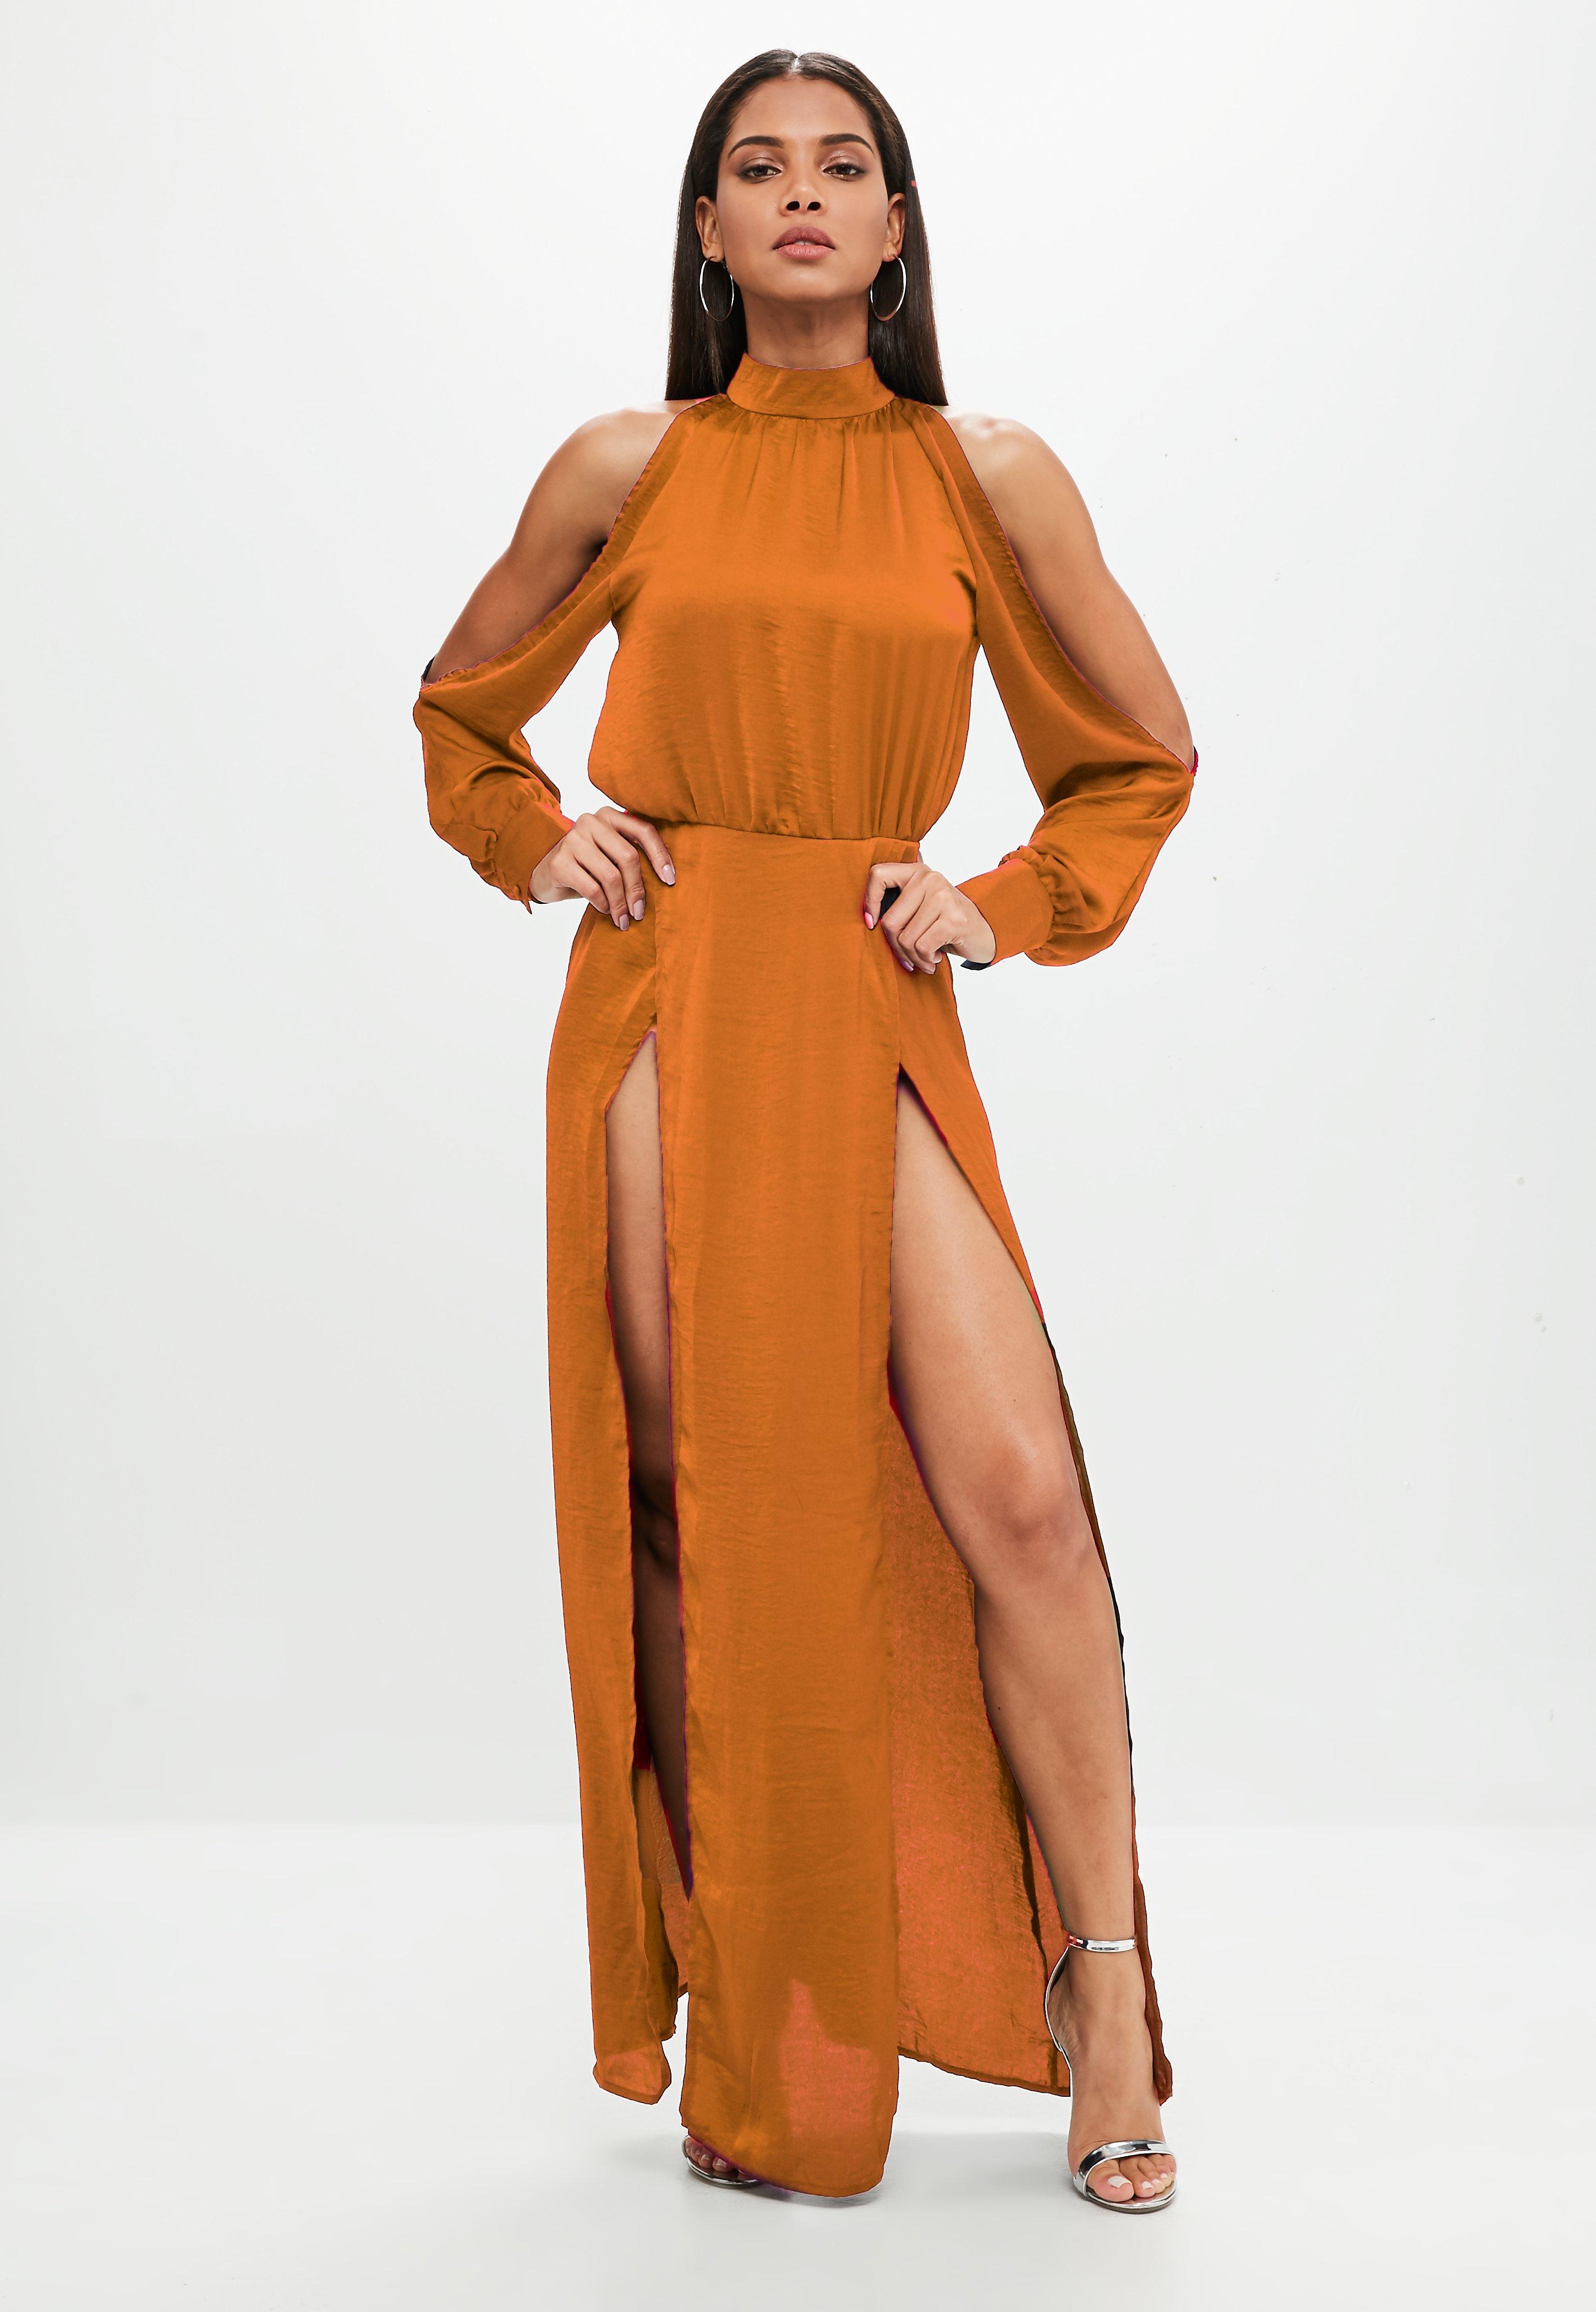 Satin Dresses | Shop Silky Dresses - Missguided